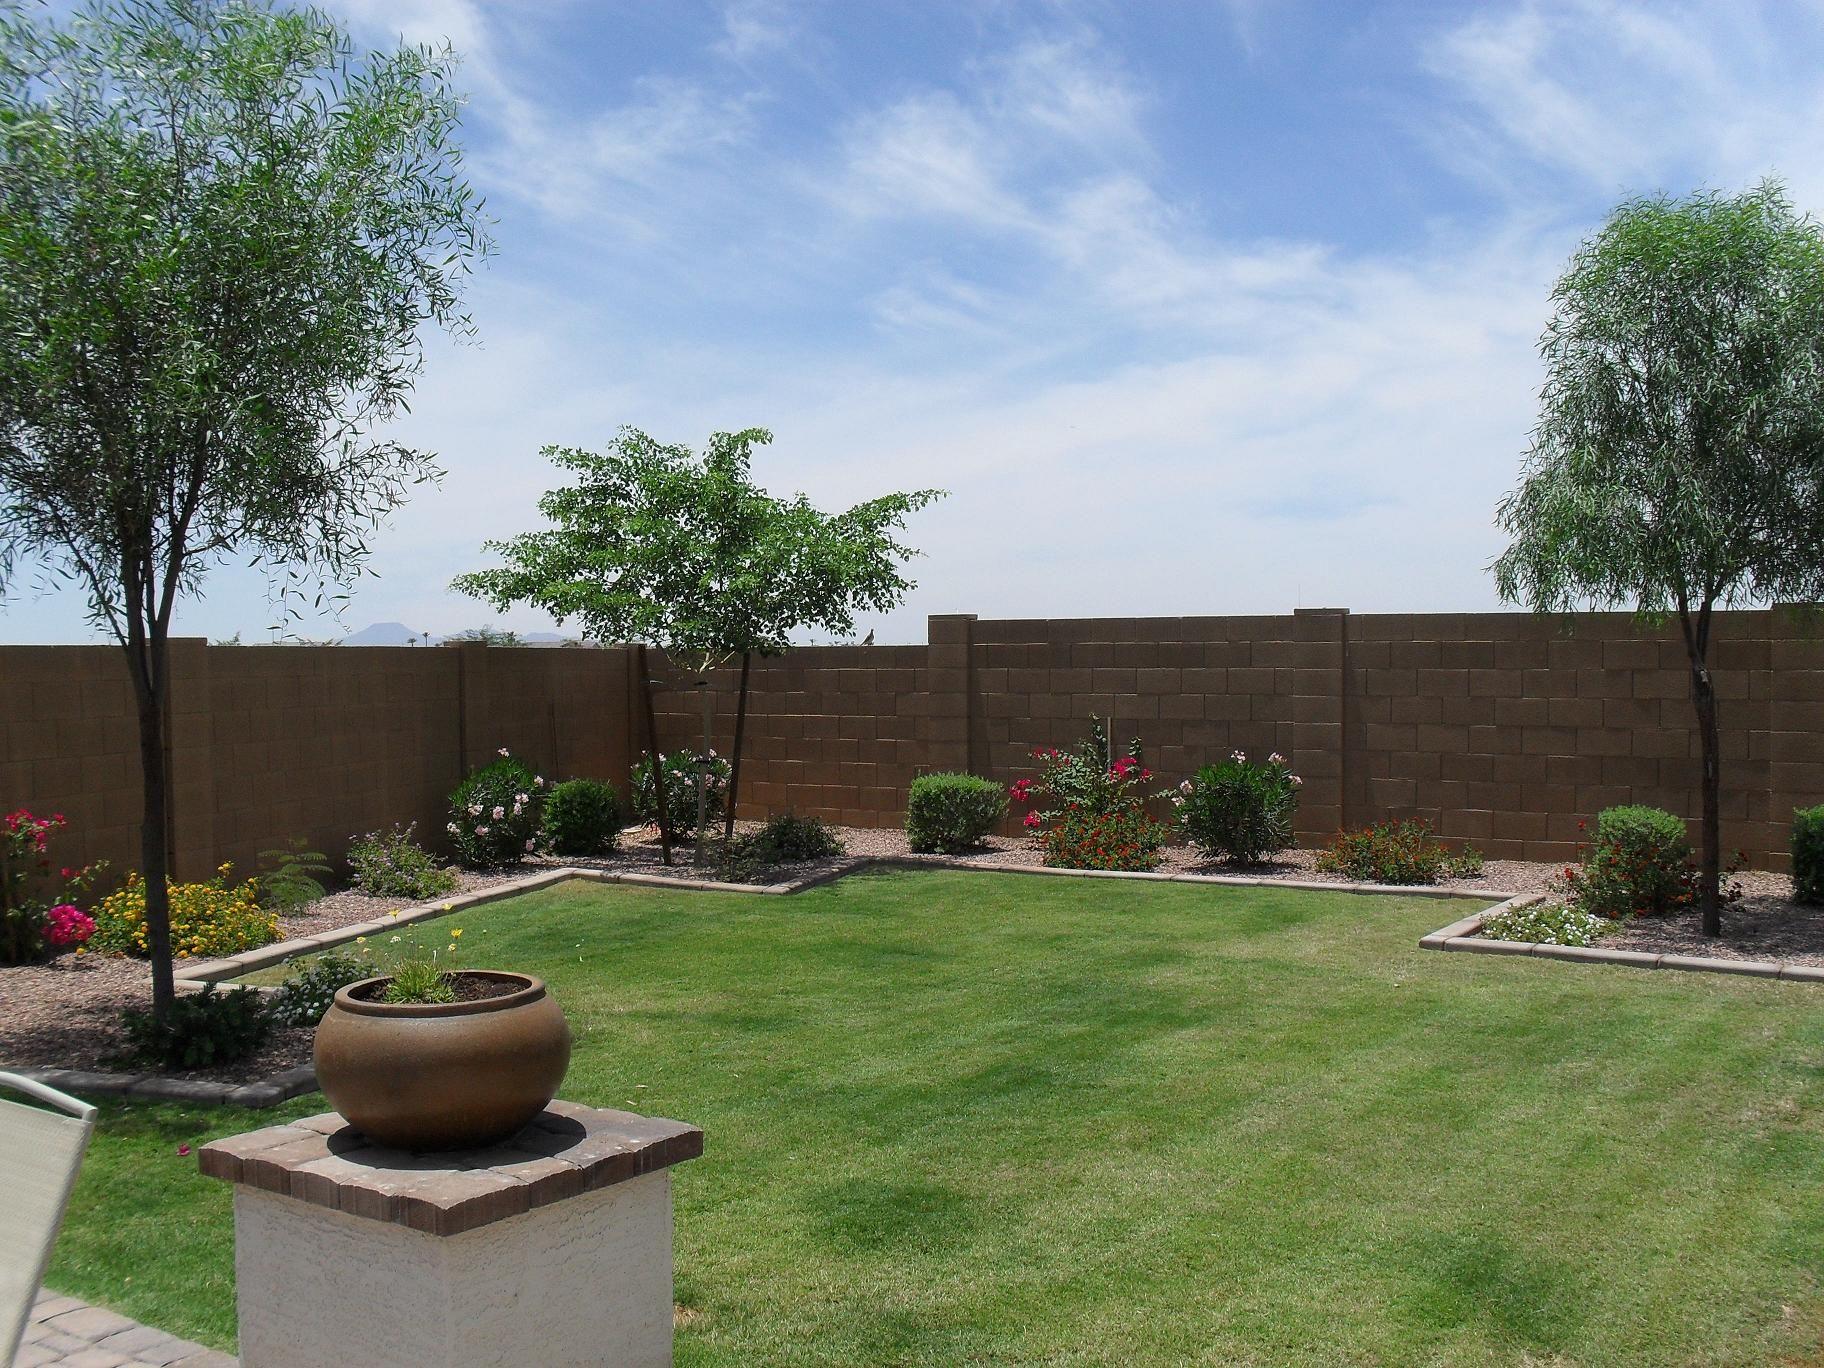 backyard | ... (and EXTREMELY nice) backyard. Pretty sure ... on Nice Backyard Landscaping Ideas id=15787